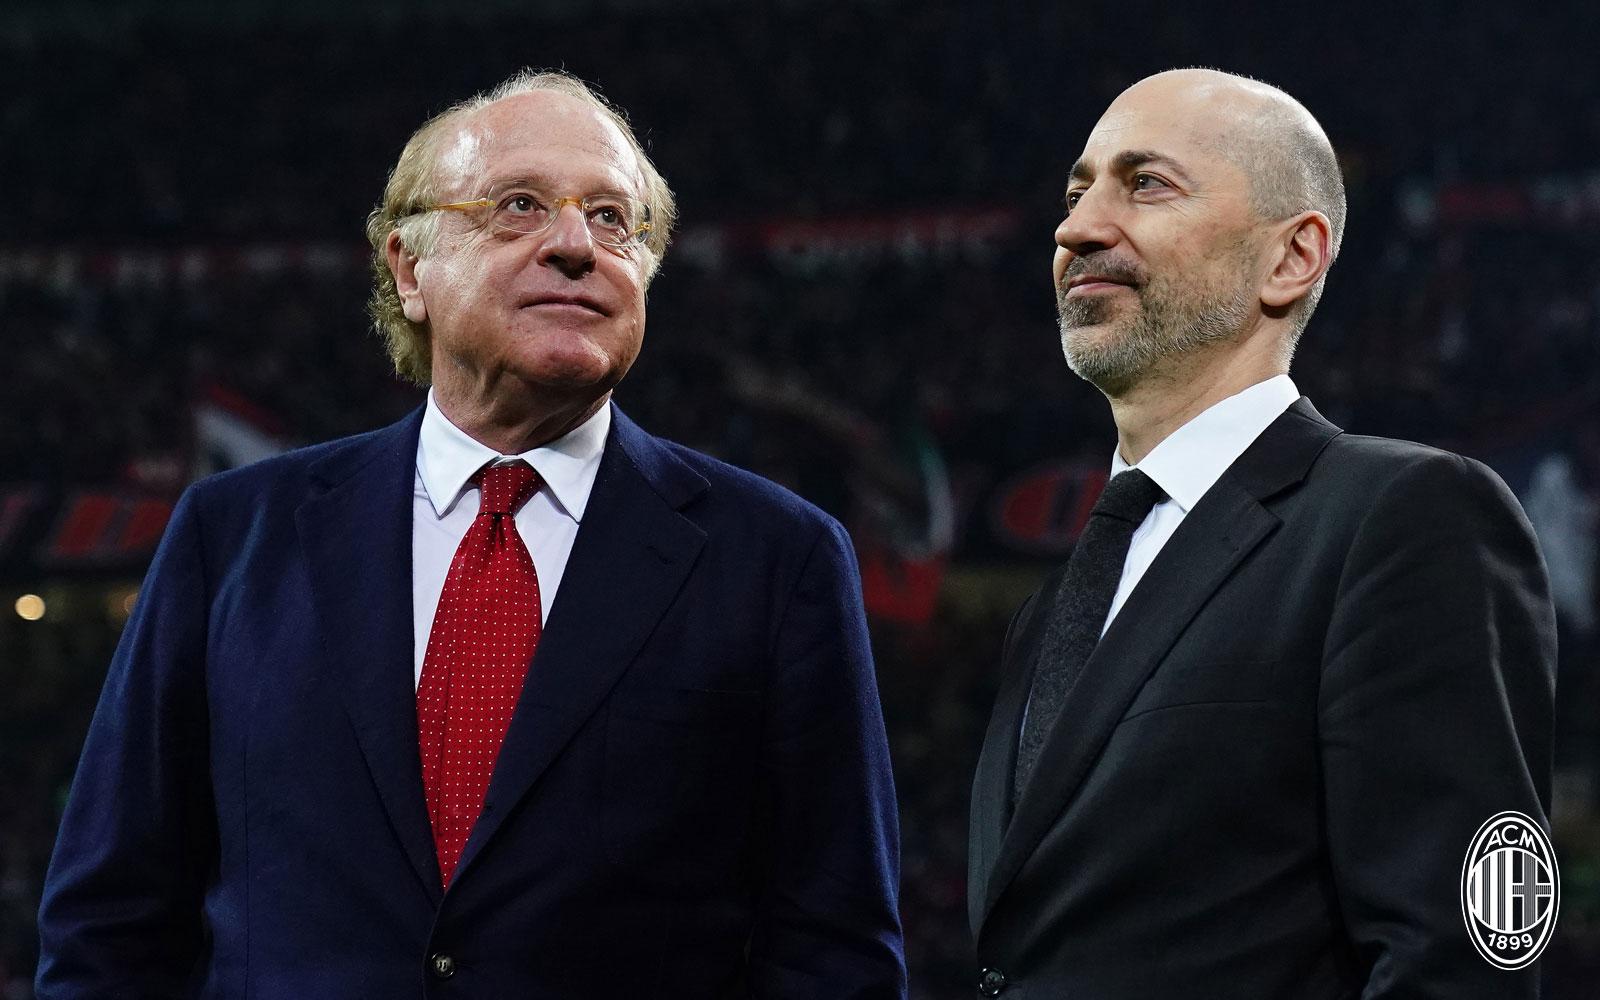 Paolo Scaroni and Ivan Gazdisi before Milan-Inter at Stadio San Siro on March 17, 2019. (@acmilan.com)